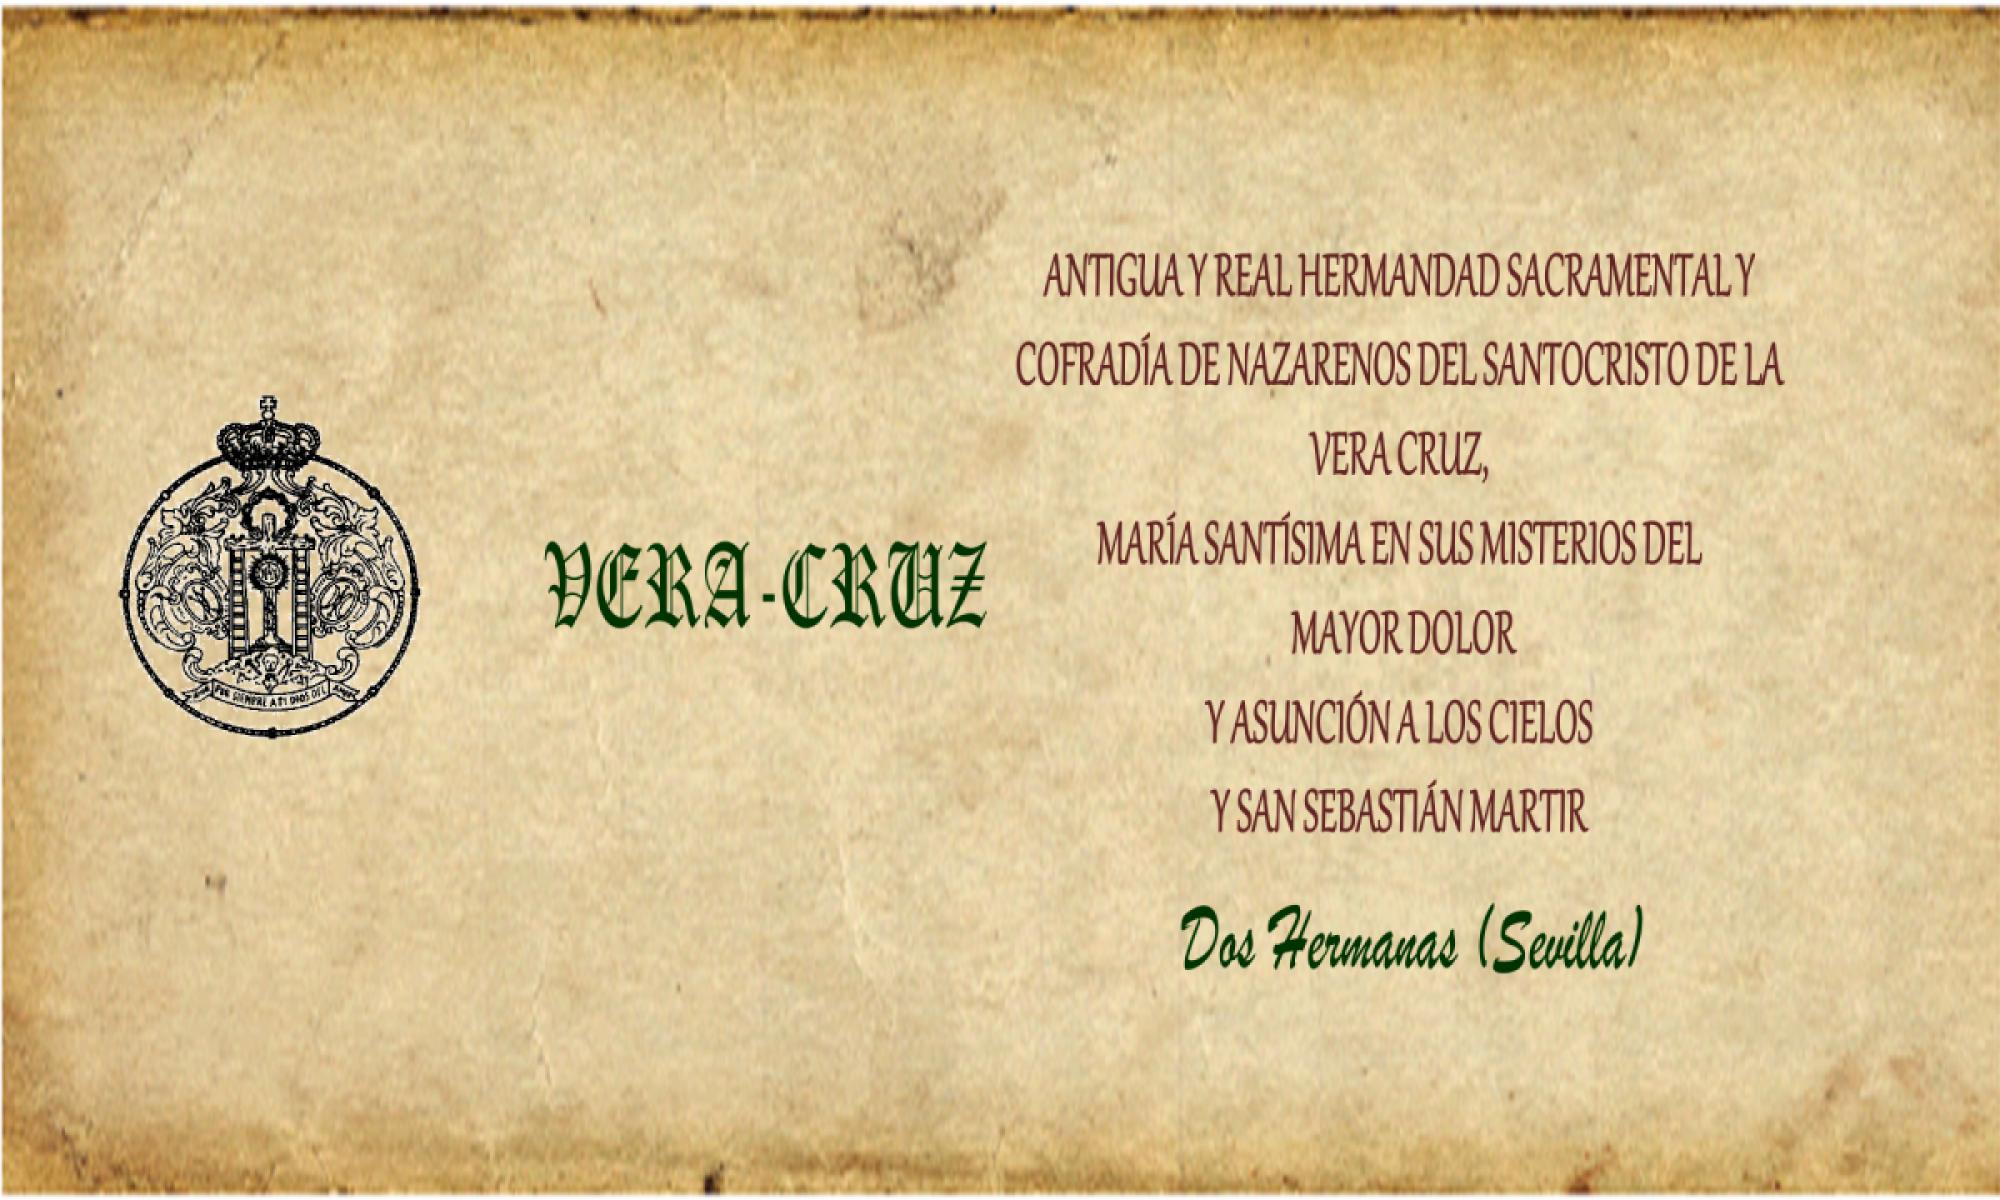 Hermandad Sacramental de la Santa Vera Cruz